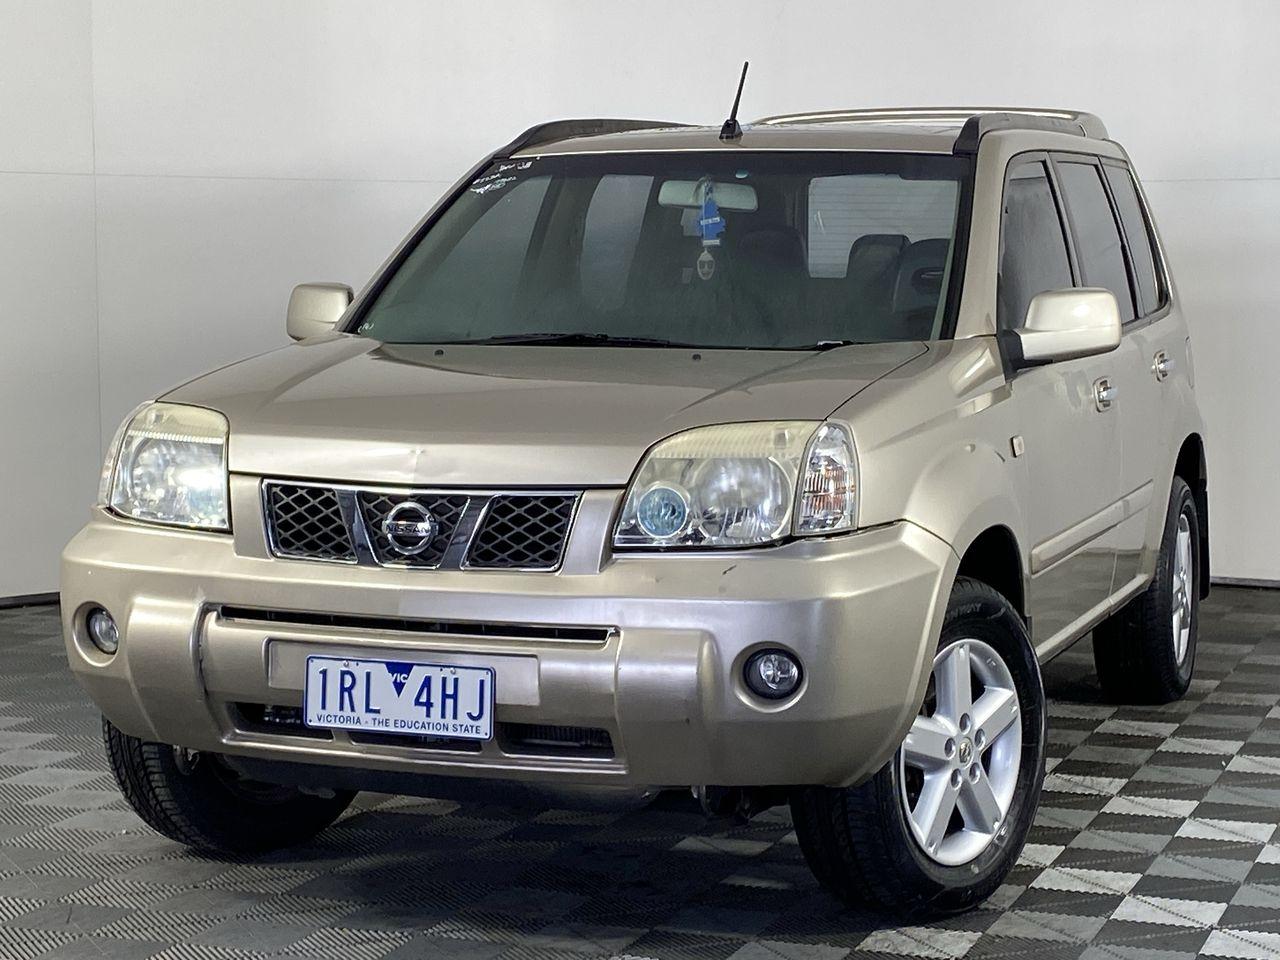 2004 Nissan X-Trail TI Luxury T30 Automatic Wagon